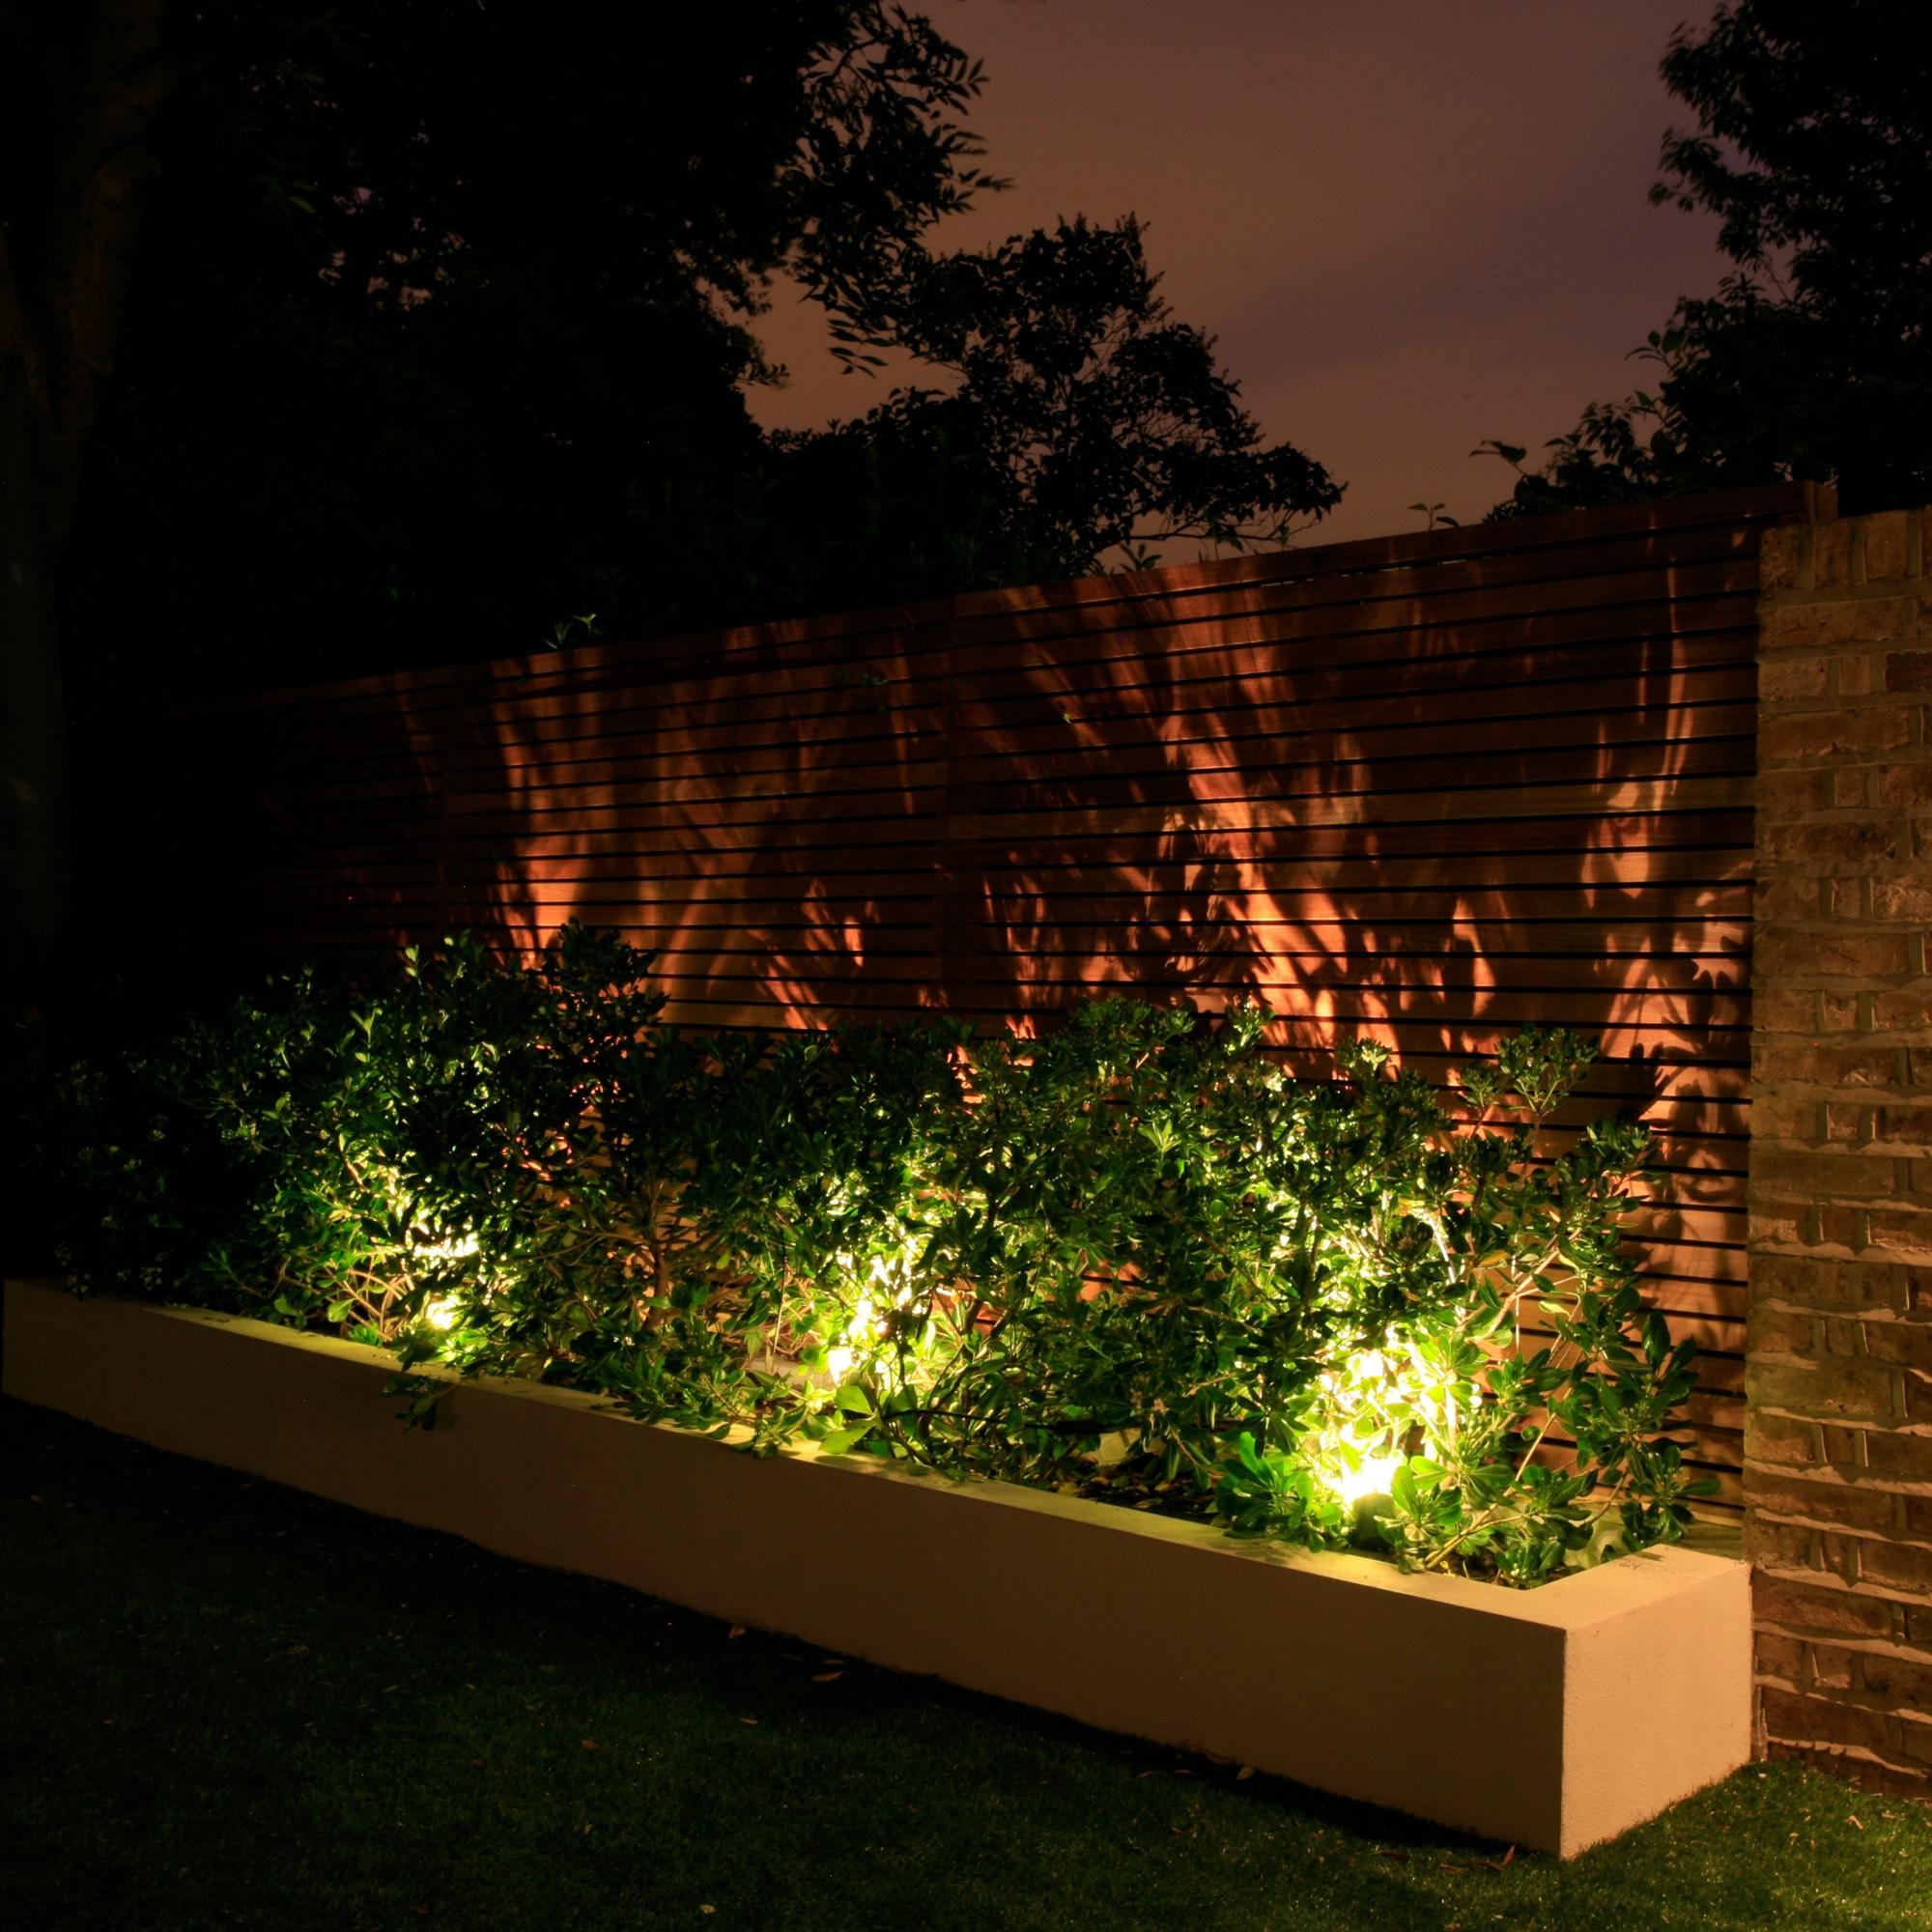 Sian Baxter Lighting Design - exterior example - www.sianbaxterlighting.com